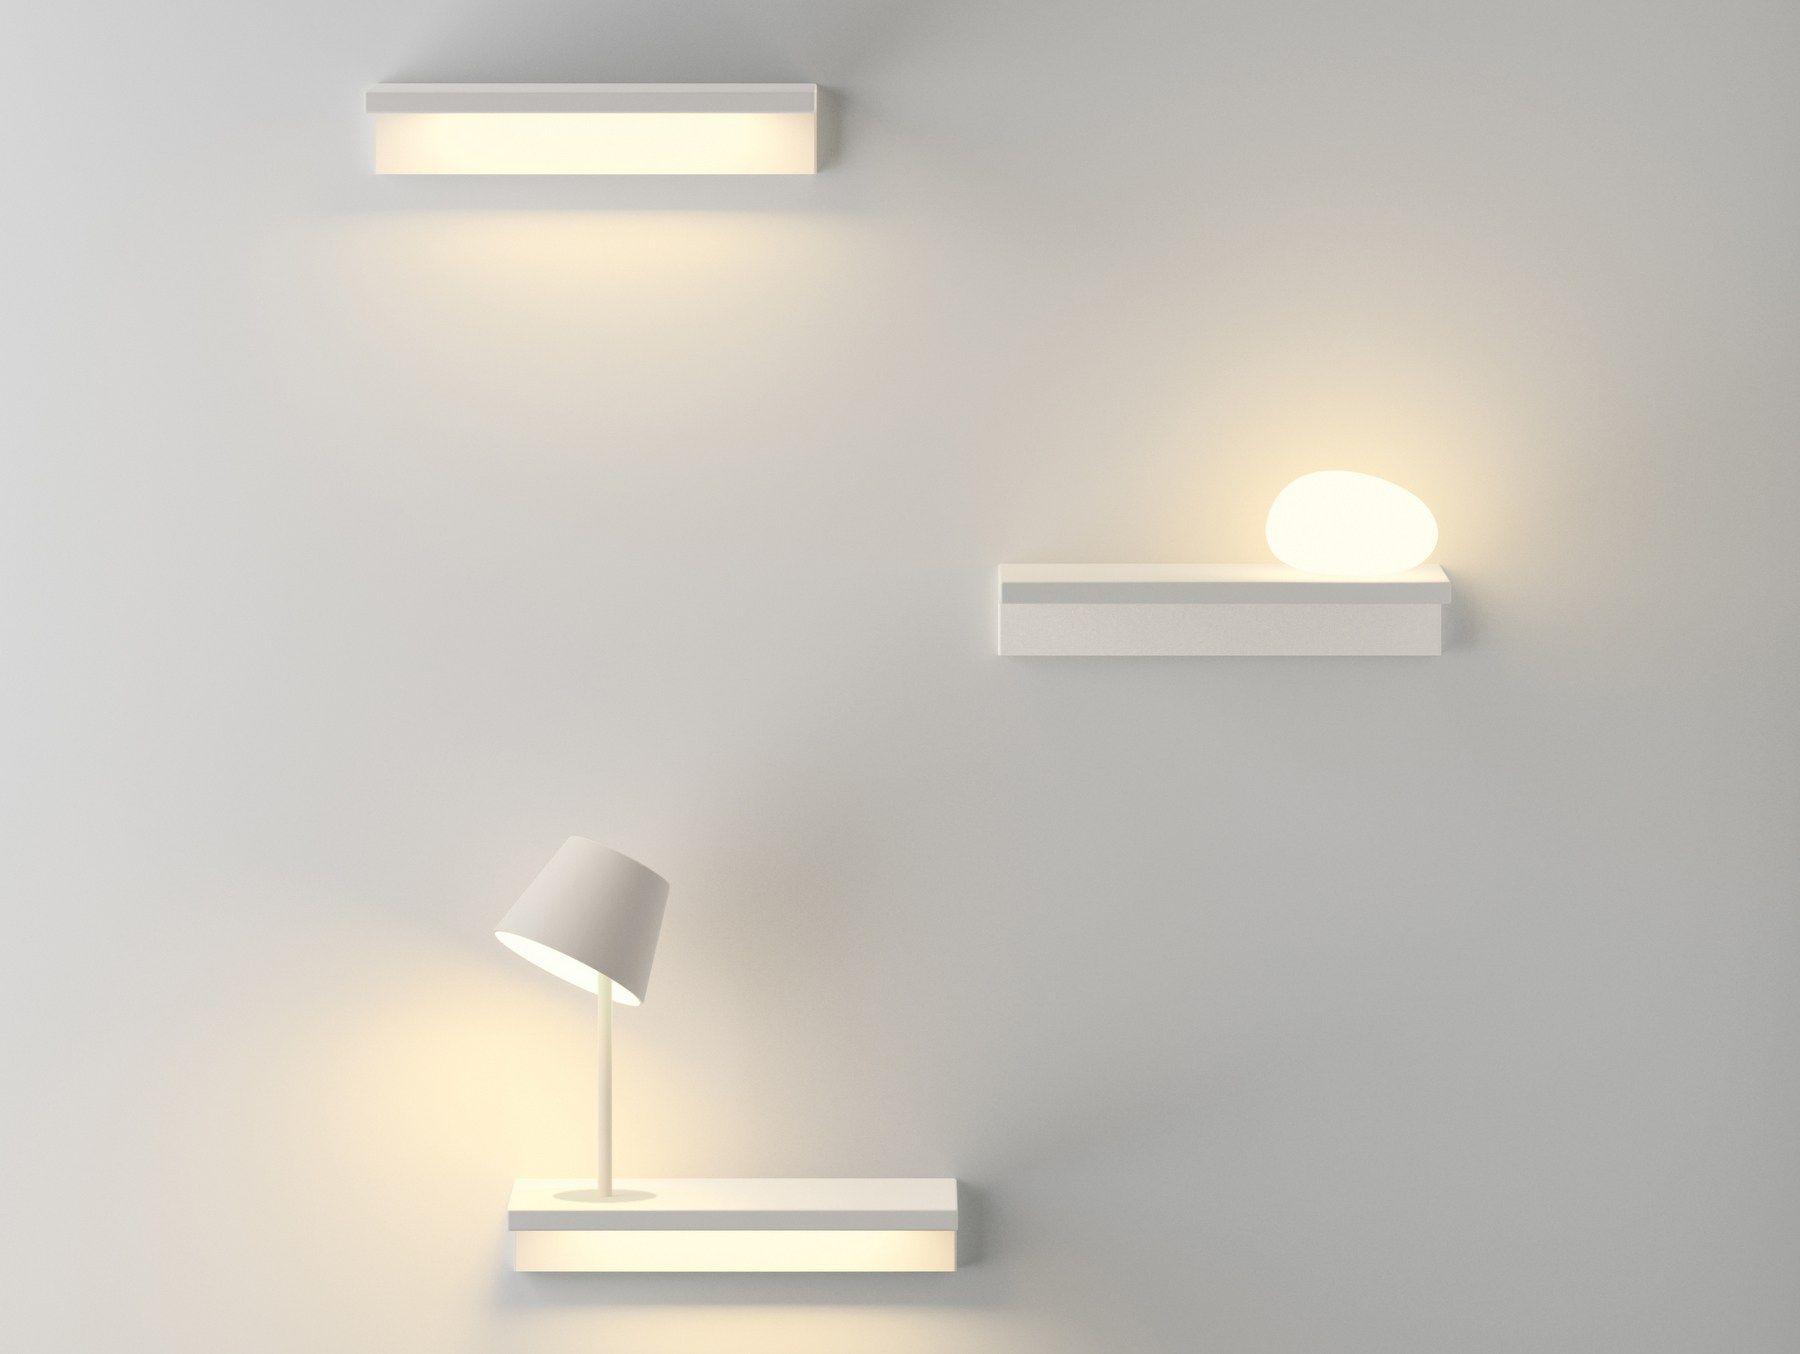 LED wall lamp SUITE 6041 by Vibia design Jordi Vilardell & Meritxell Vidal